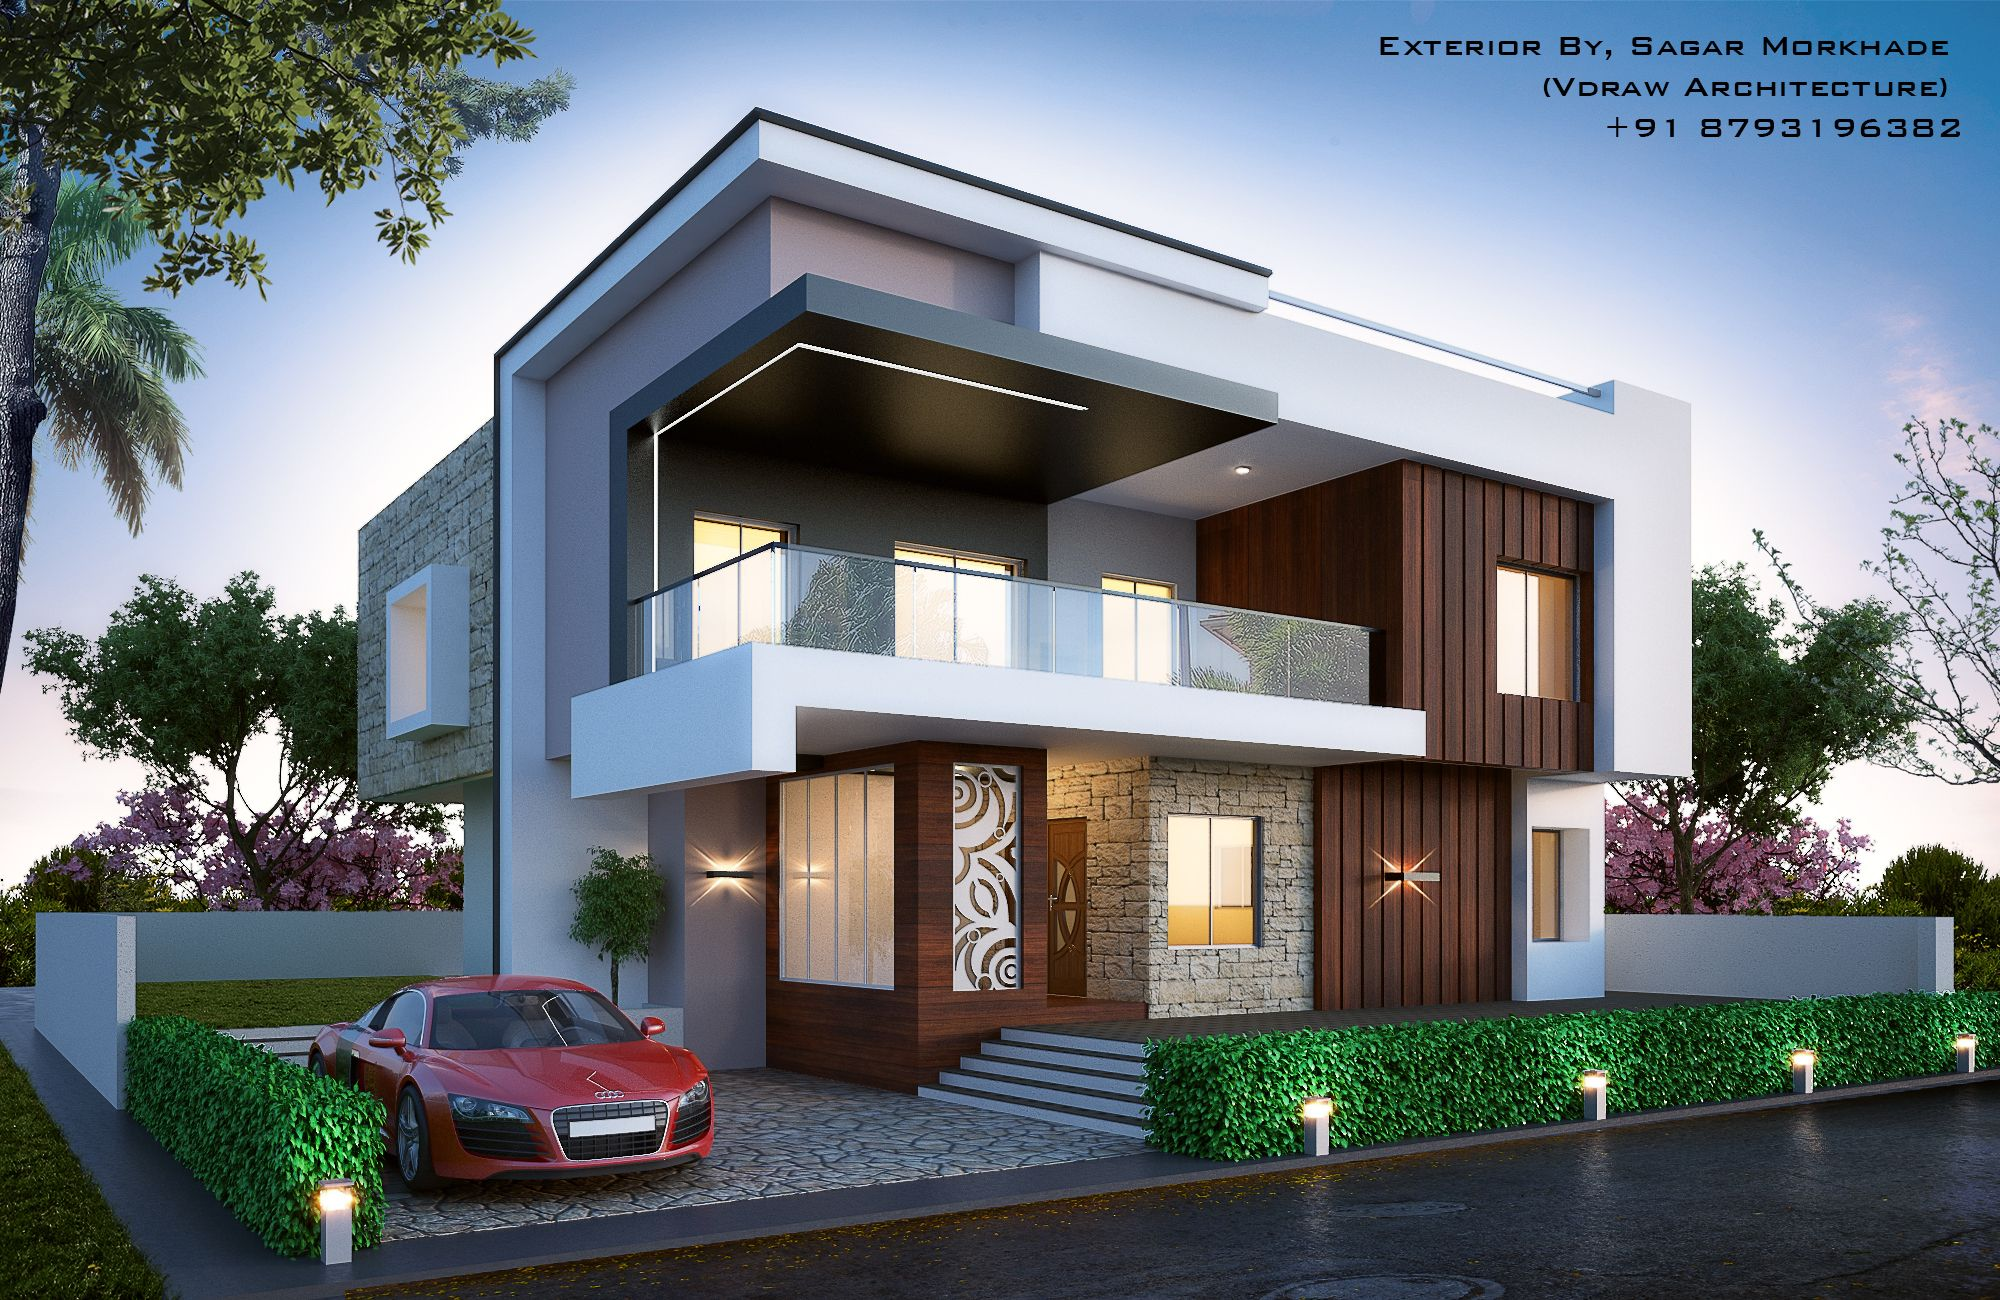 Modern Bungalow Exterior By, Sagar Morkhade (Vdraw